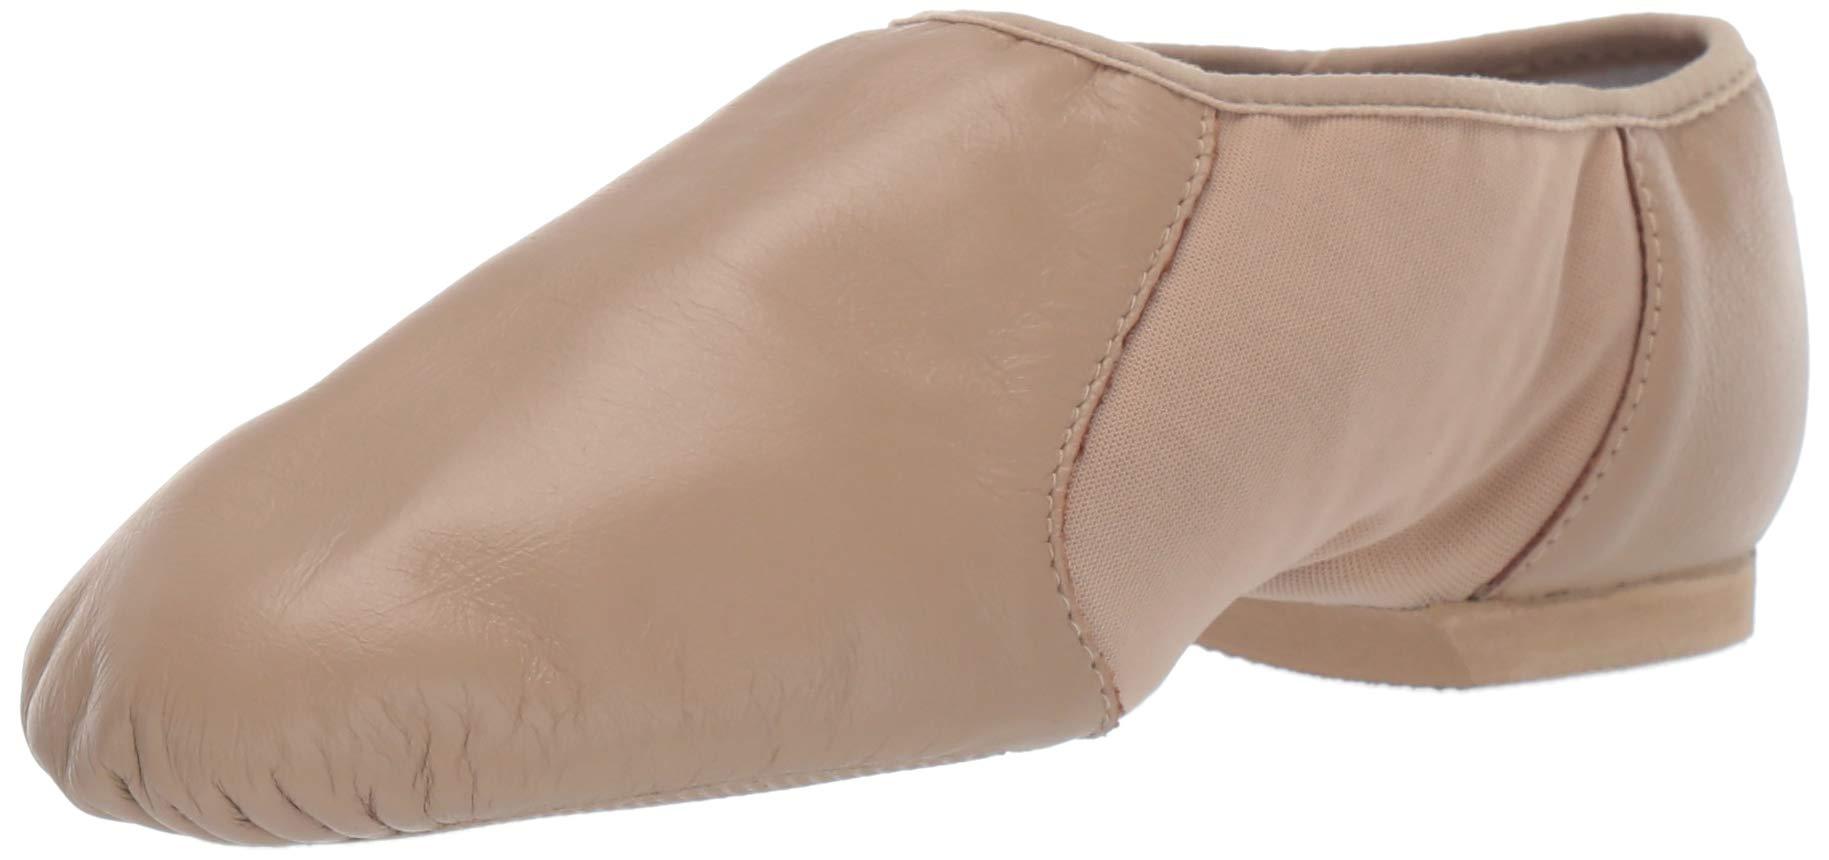 Bloch Neo-Flex Jazz Shoe S0495L, Taupe, 10 M US by Bloch